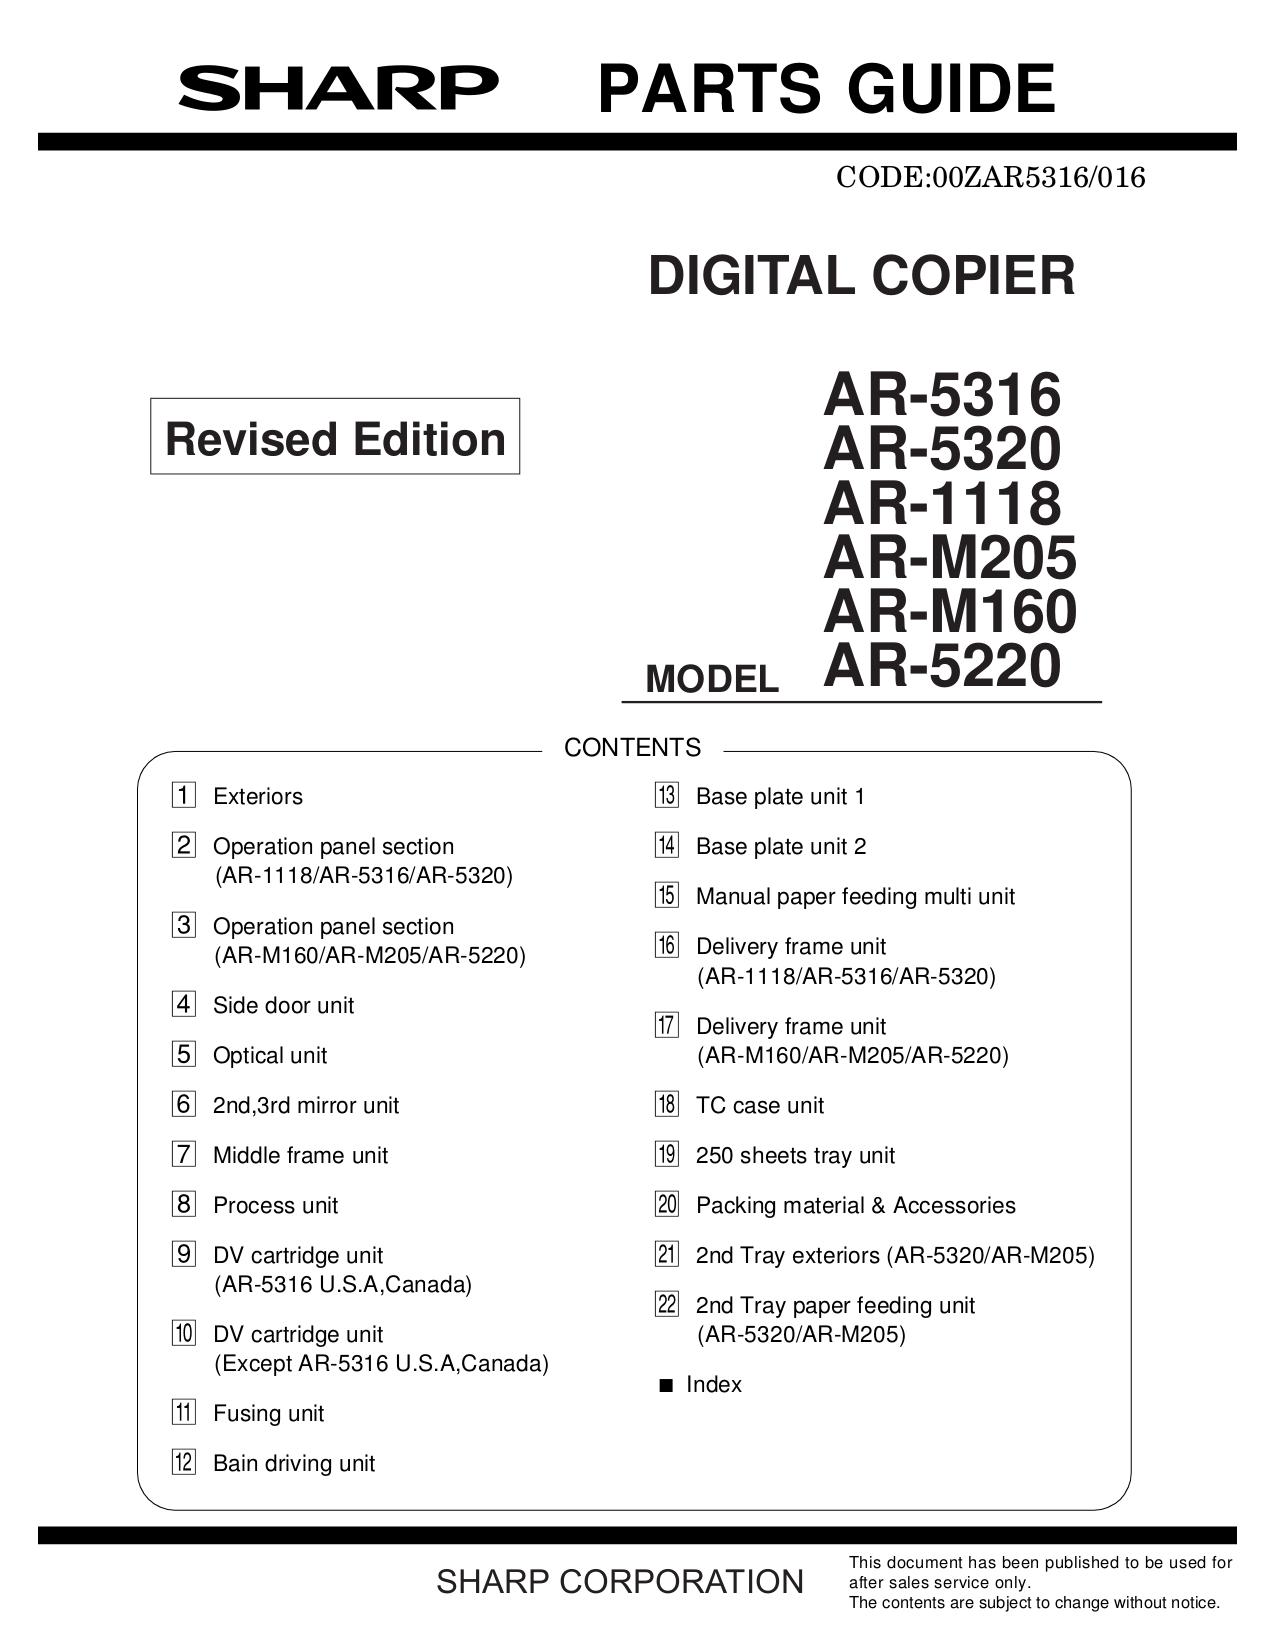 download free pdf for sharp ar 5316 copier manual rh umlib com sharp ar-5316 manual pdf sharp ar 5316 service manual free download